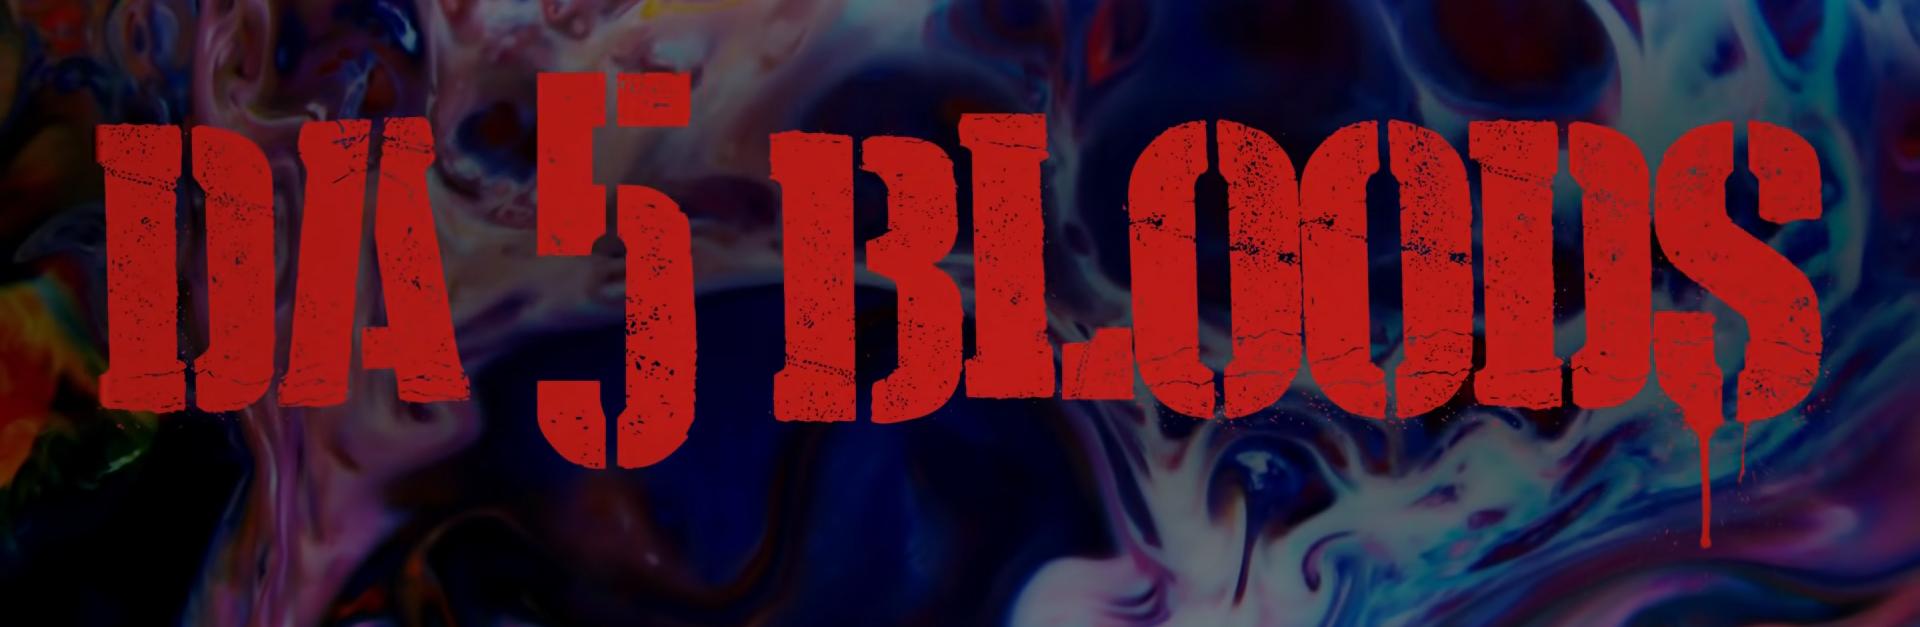 Da 5 Bloods. Image Credit: Netflix.